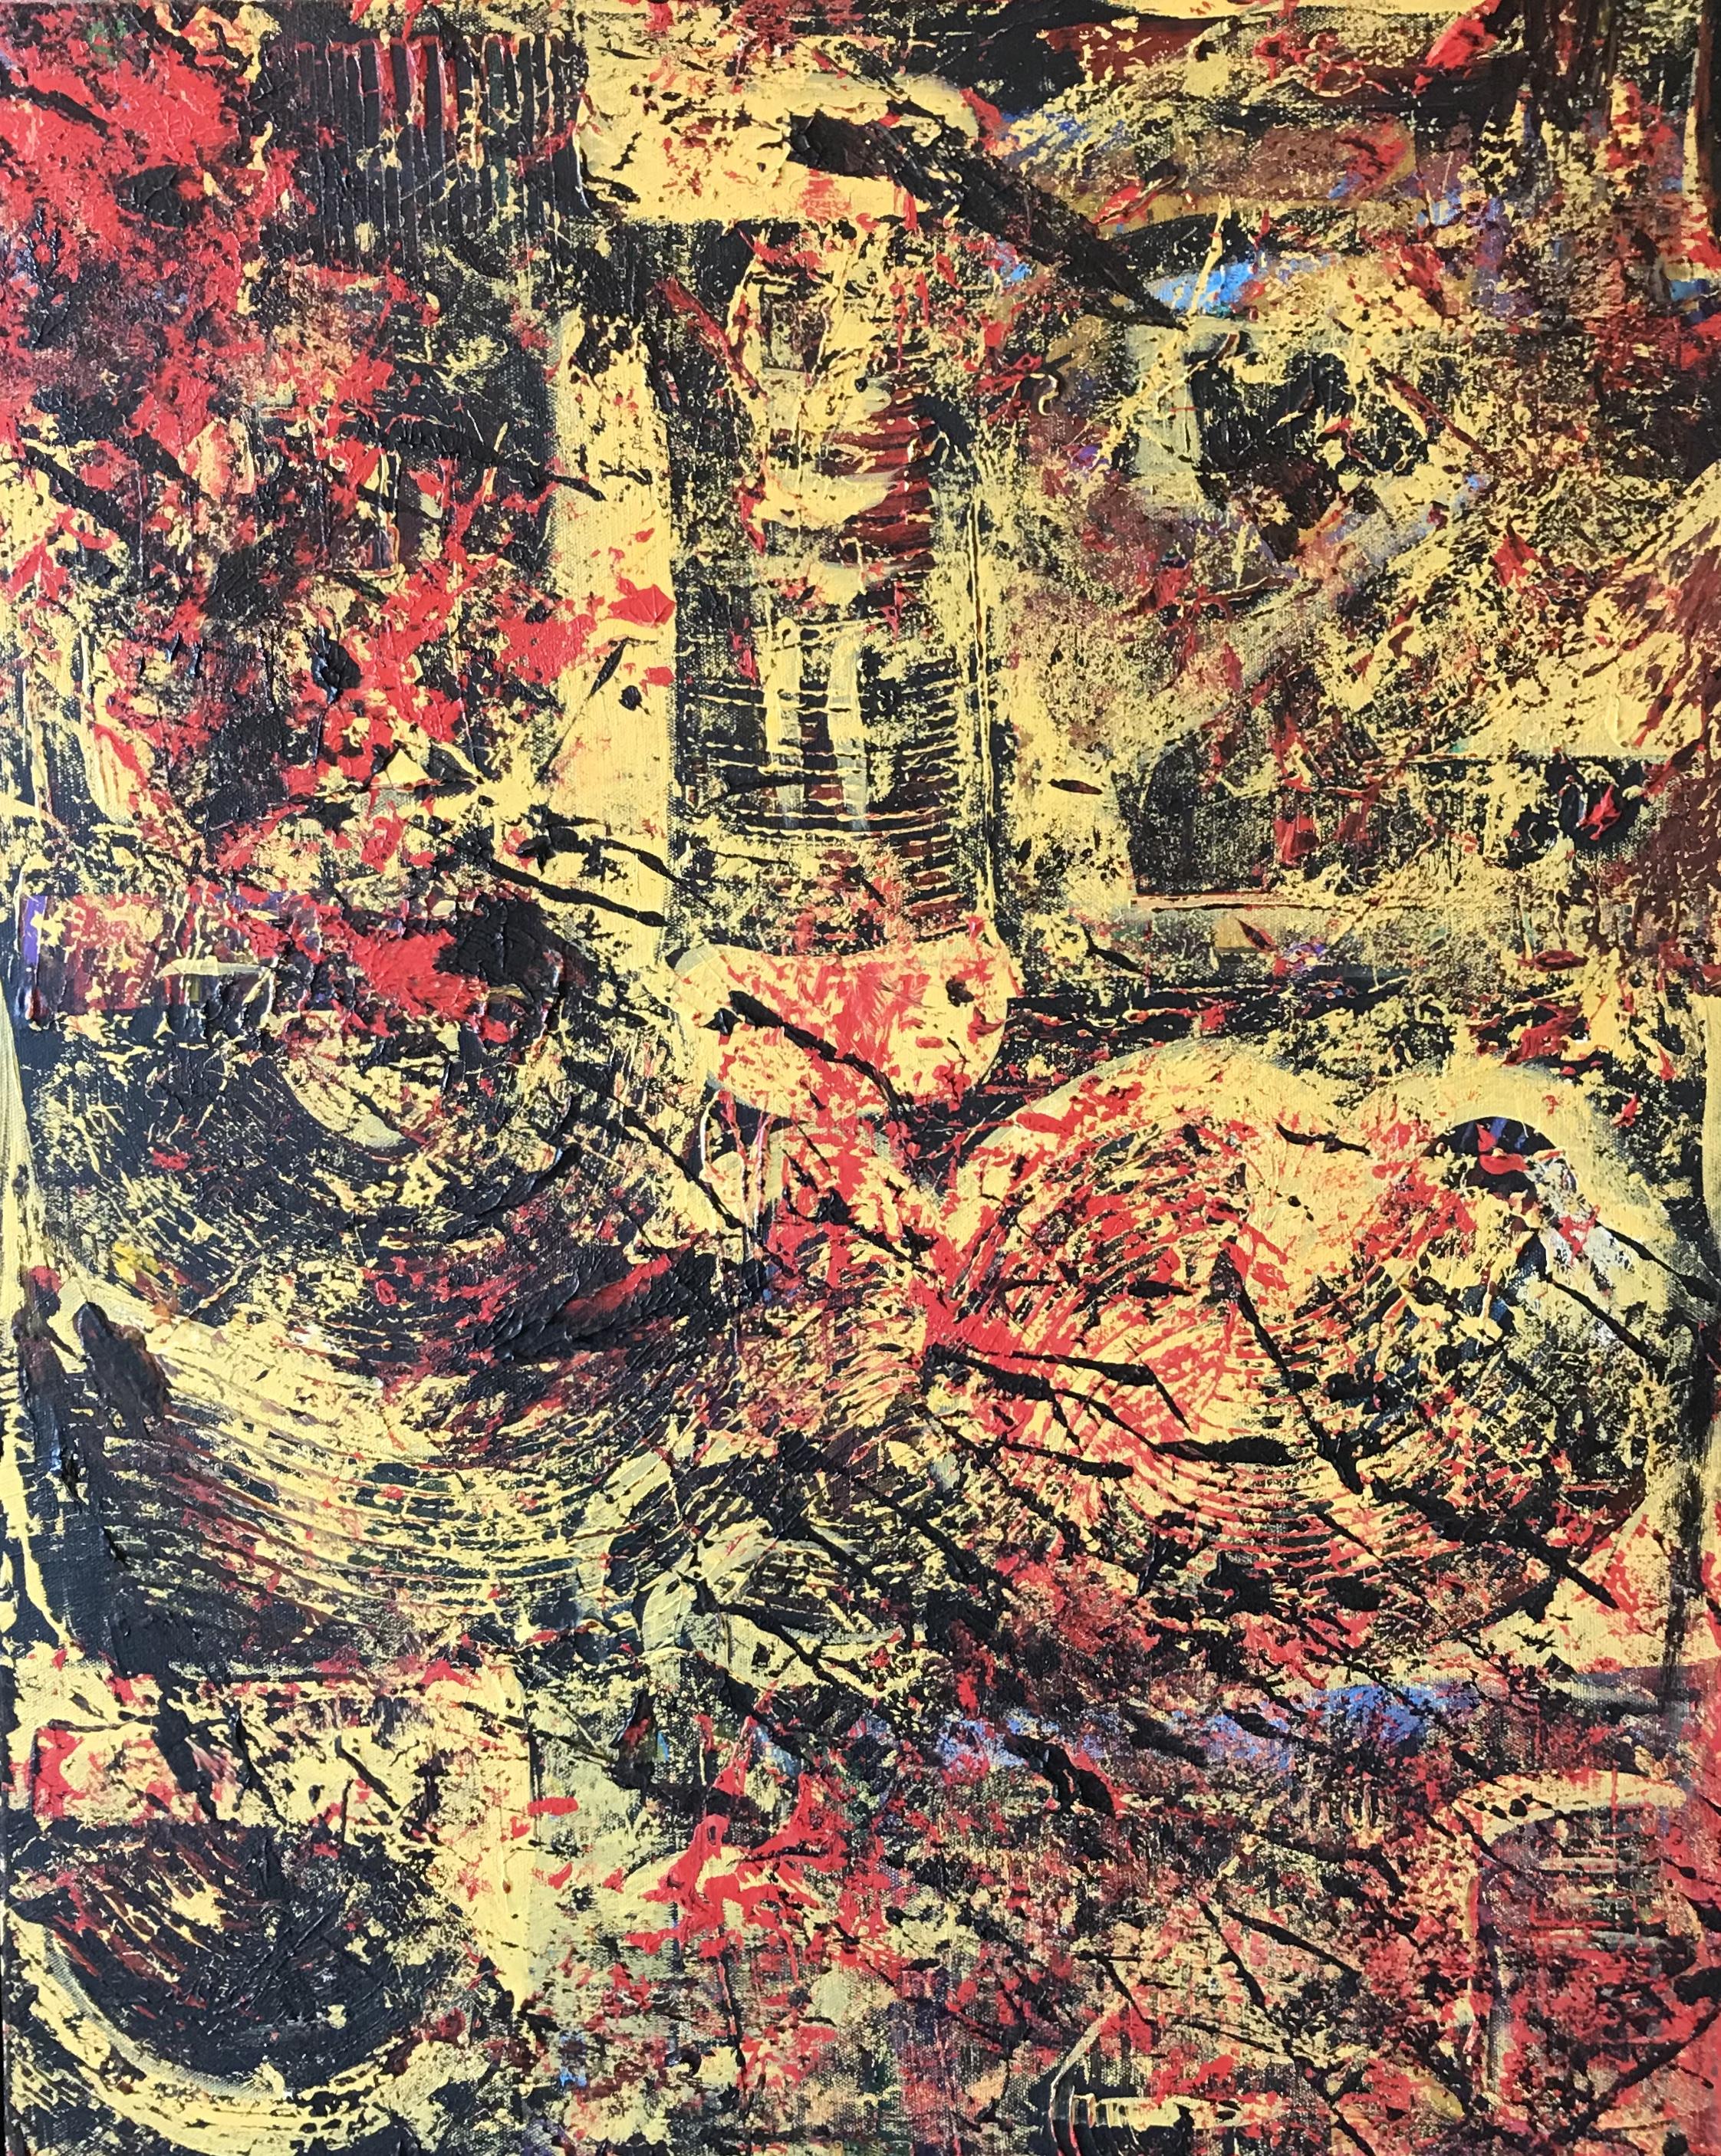 Sheila Cahill - _Spindle_ - 26 x 38 - Acrylic on canvas - 2018 - $1100 copy.jpeg